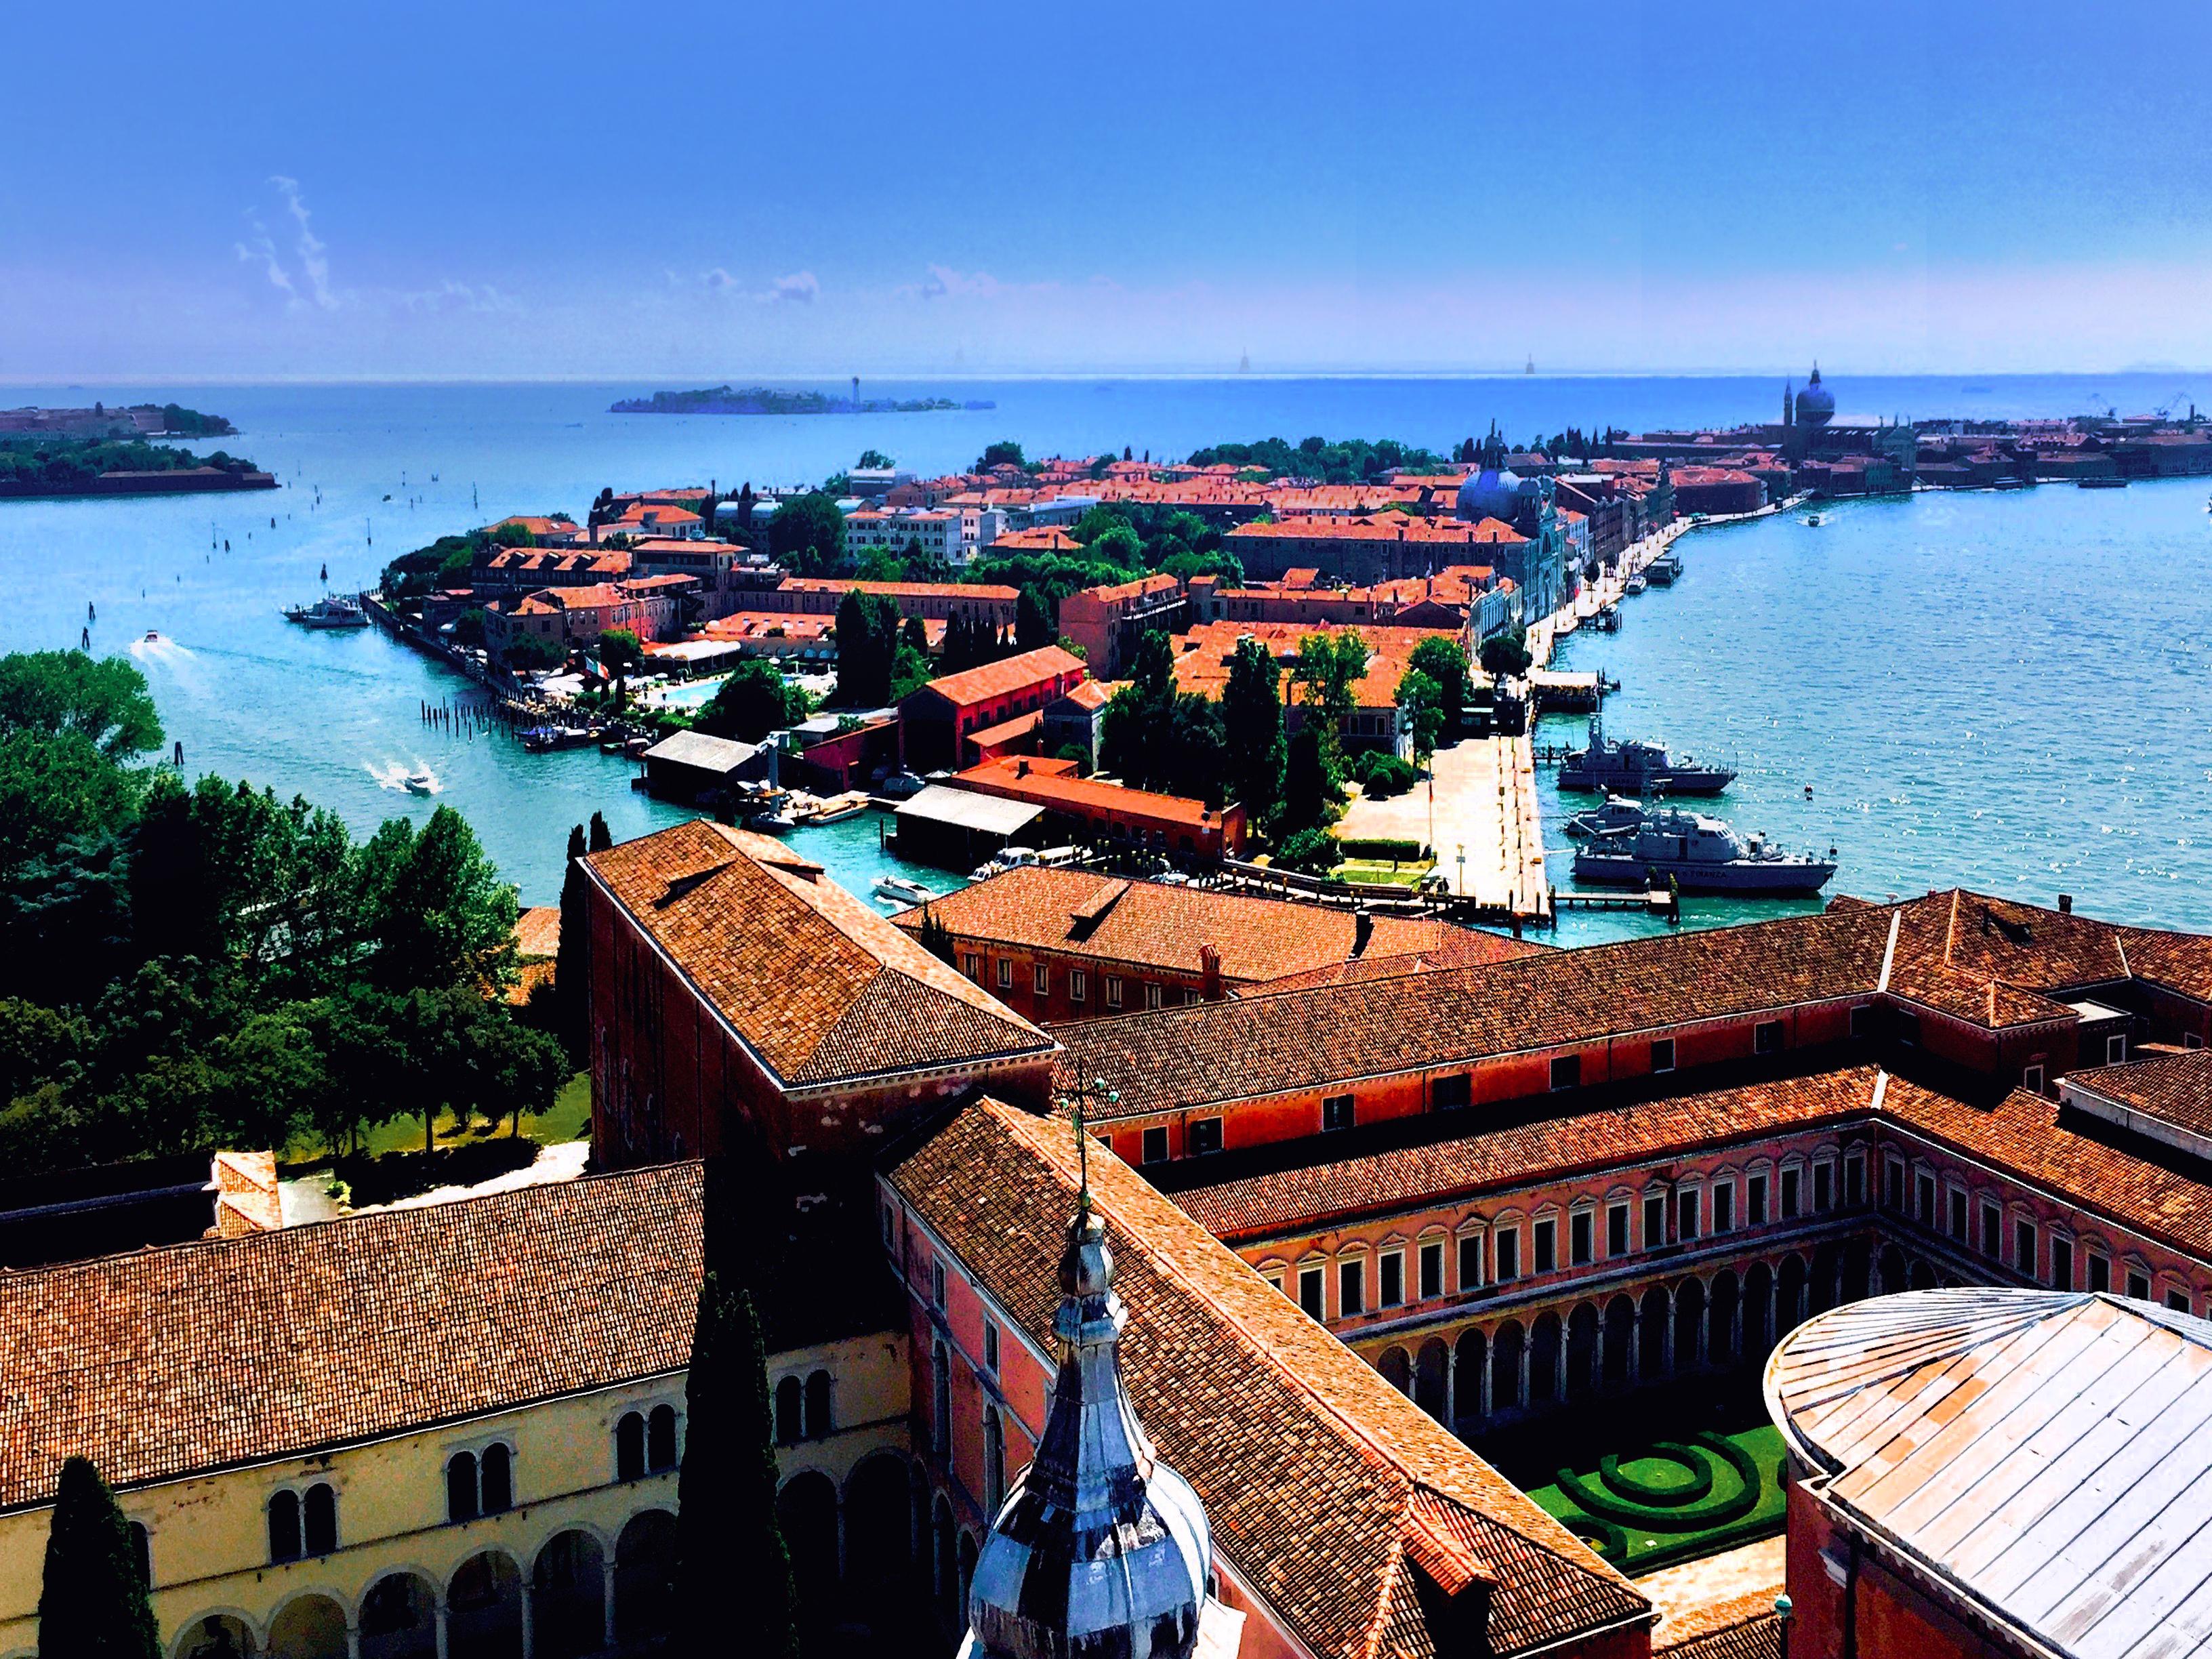 Aerial Photo Above Giudecca, Venice